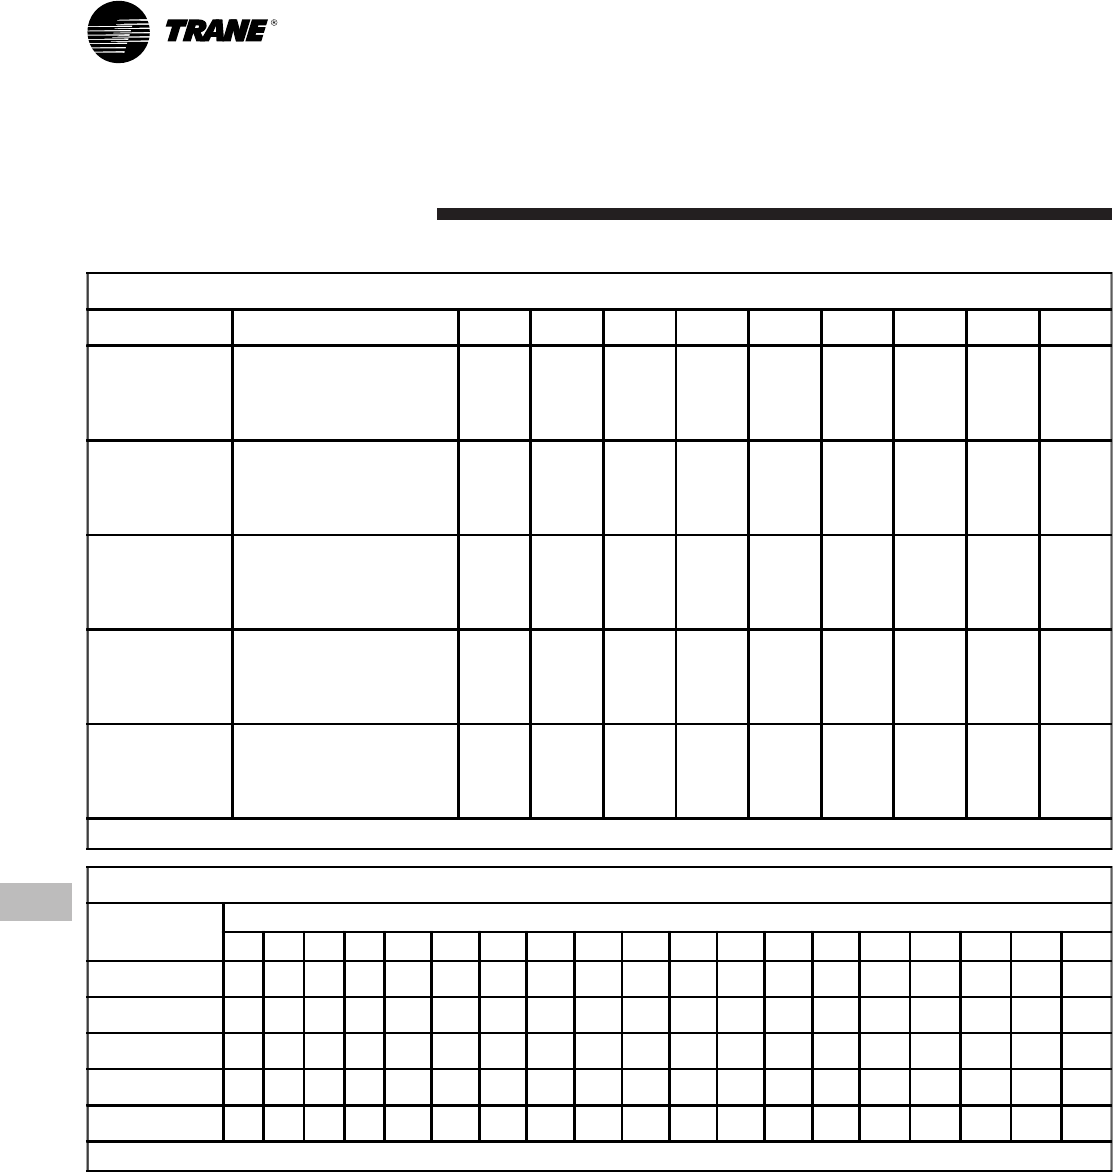 Trane Xr90 Service Manual Wiring Diagram Xr 90 Series